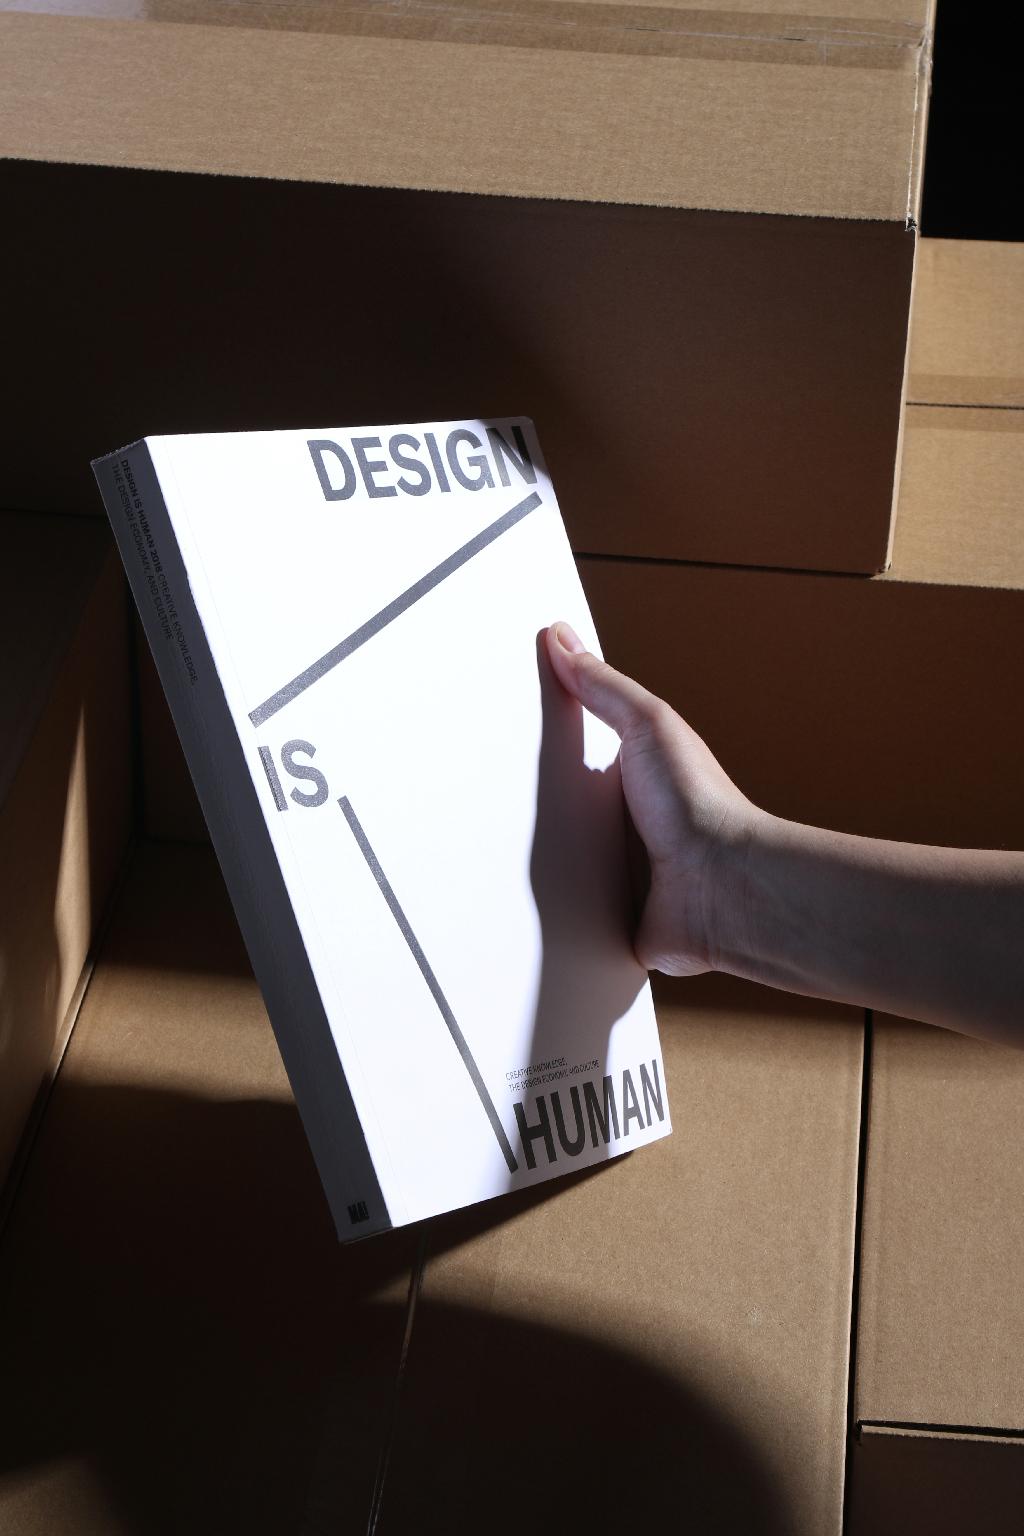 Studio-Verena-Hennig-Atlanta-Design-Festival-Book-Design-2018.jpg